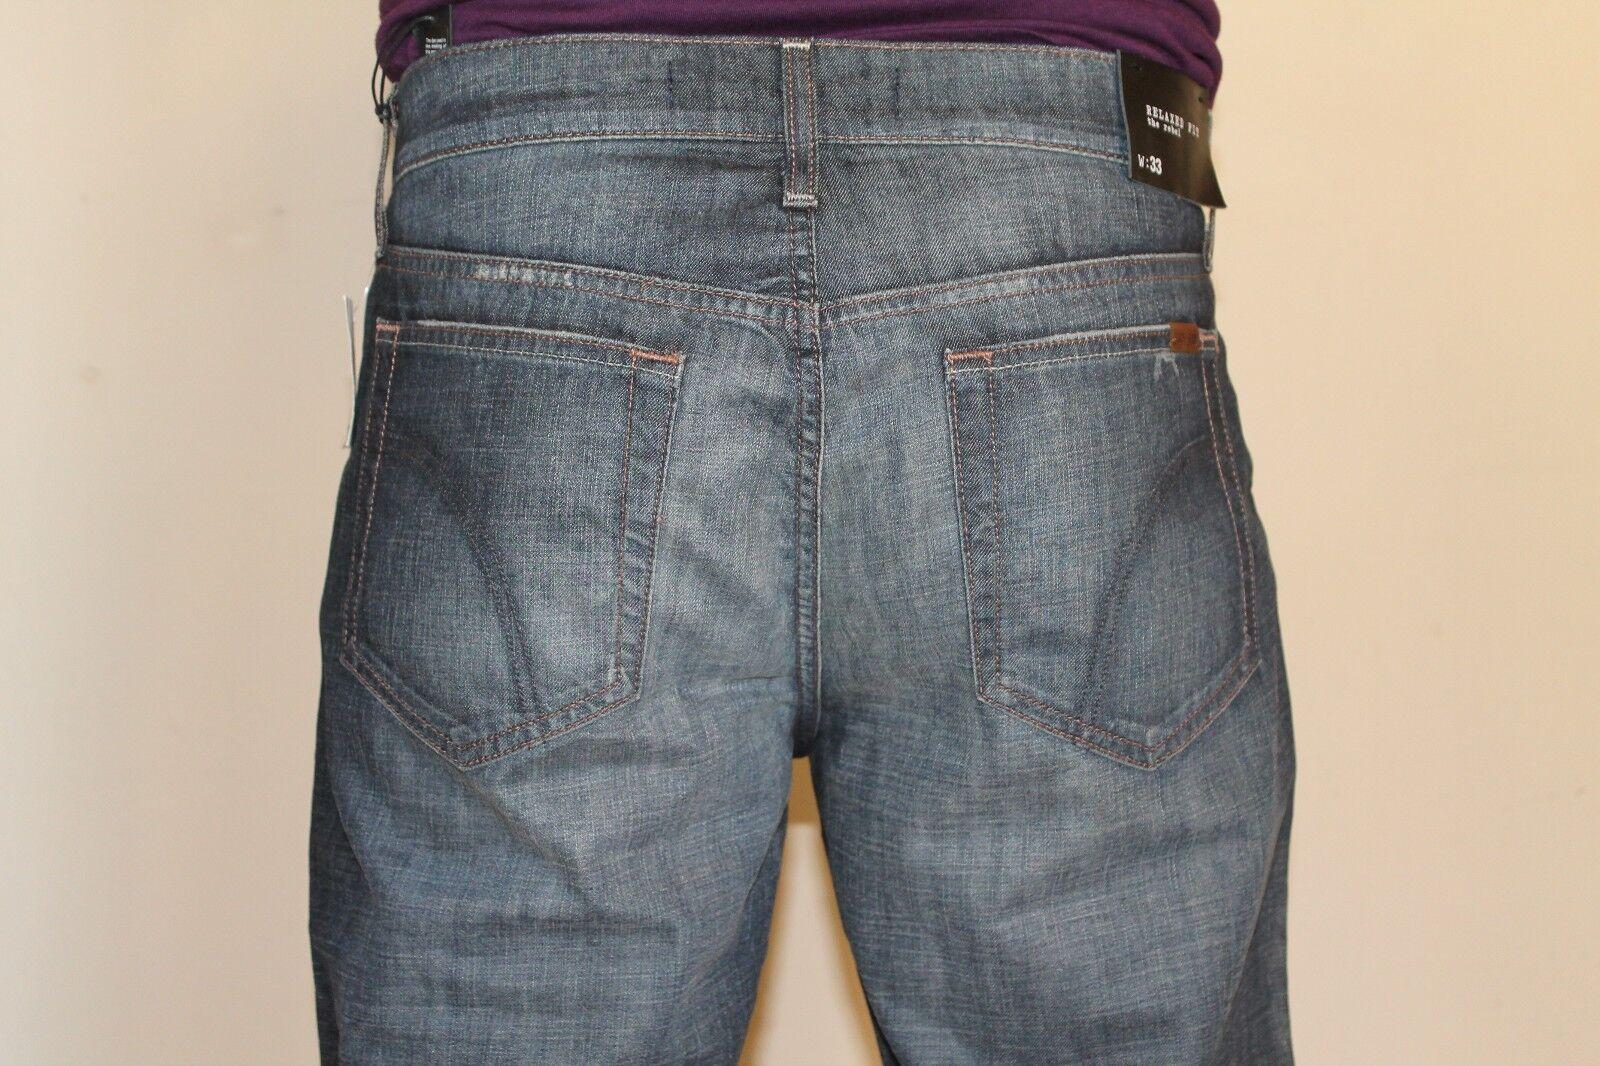 NWT Joe's Jean Men Trey Rebel Relaxed Fit Size 31X33, 33X33, 34X33